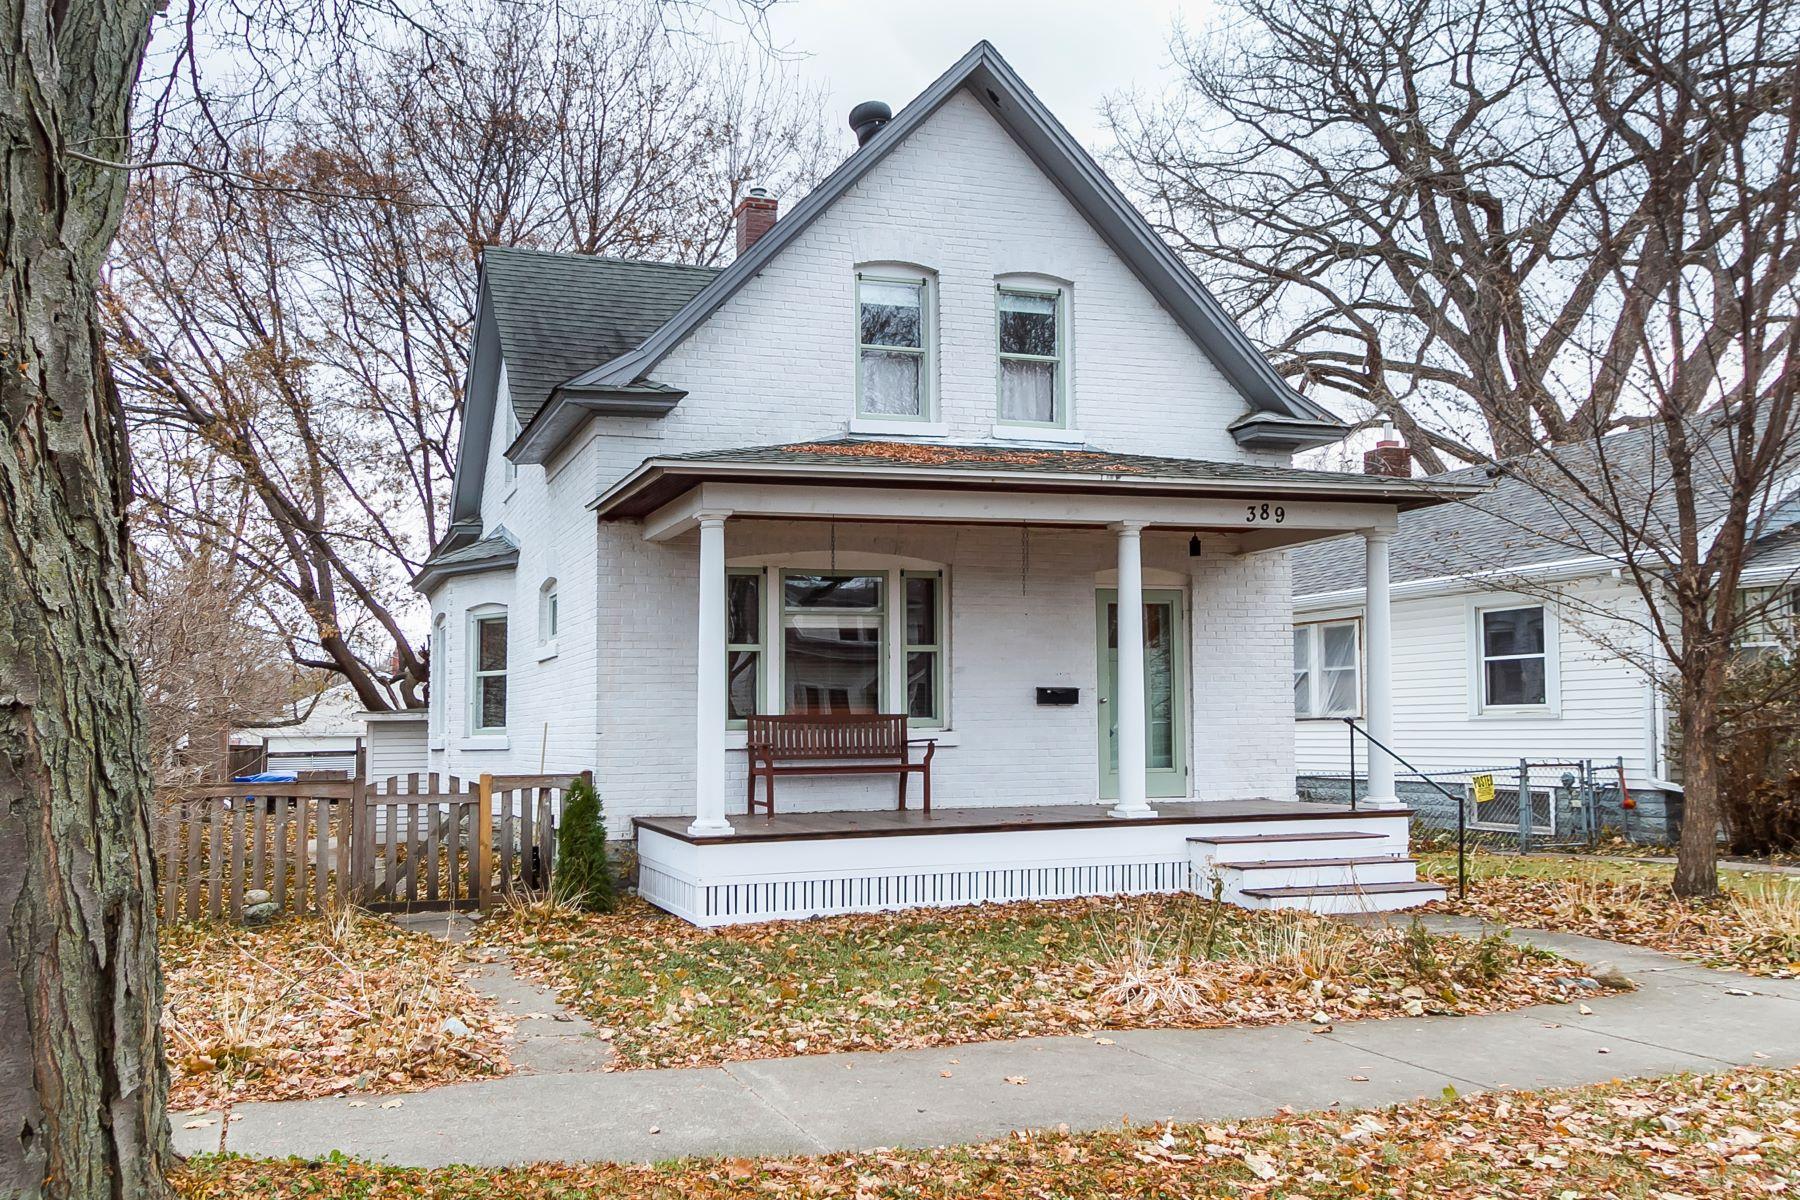 Single Family Homes for Sale at 389 Fulton Street St. Paul, Minnesota 55102 United States